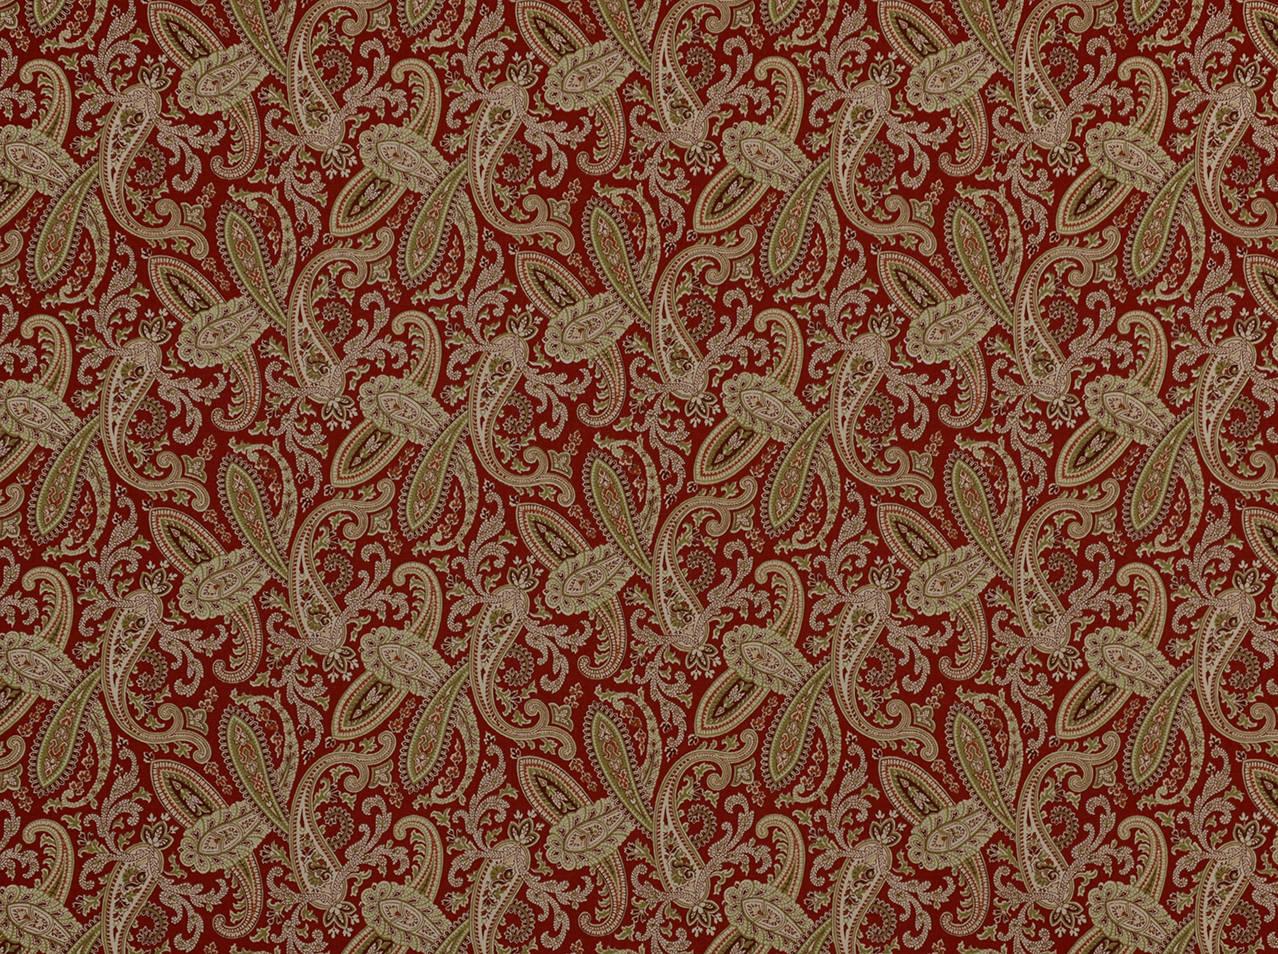 covington fabric and design products covington prints covington fabric and design products covington prints ballard 353 crimson